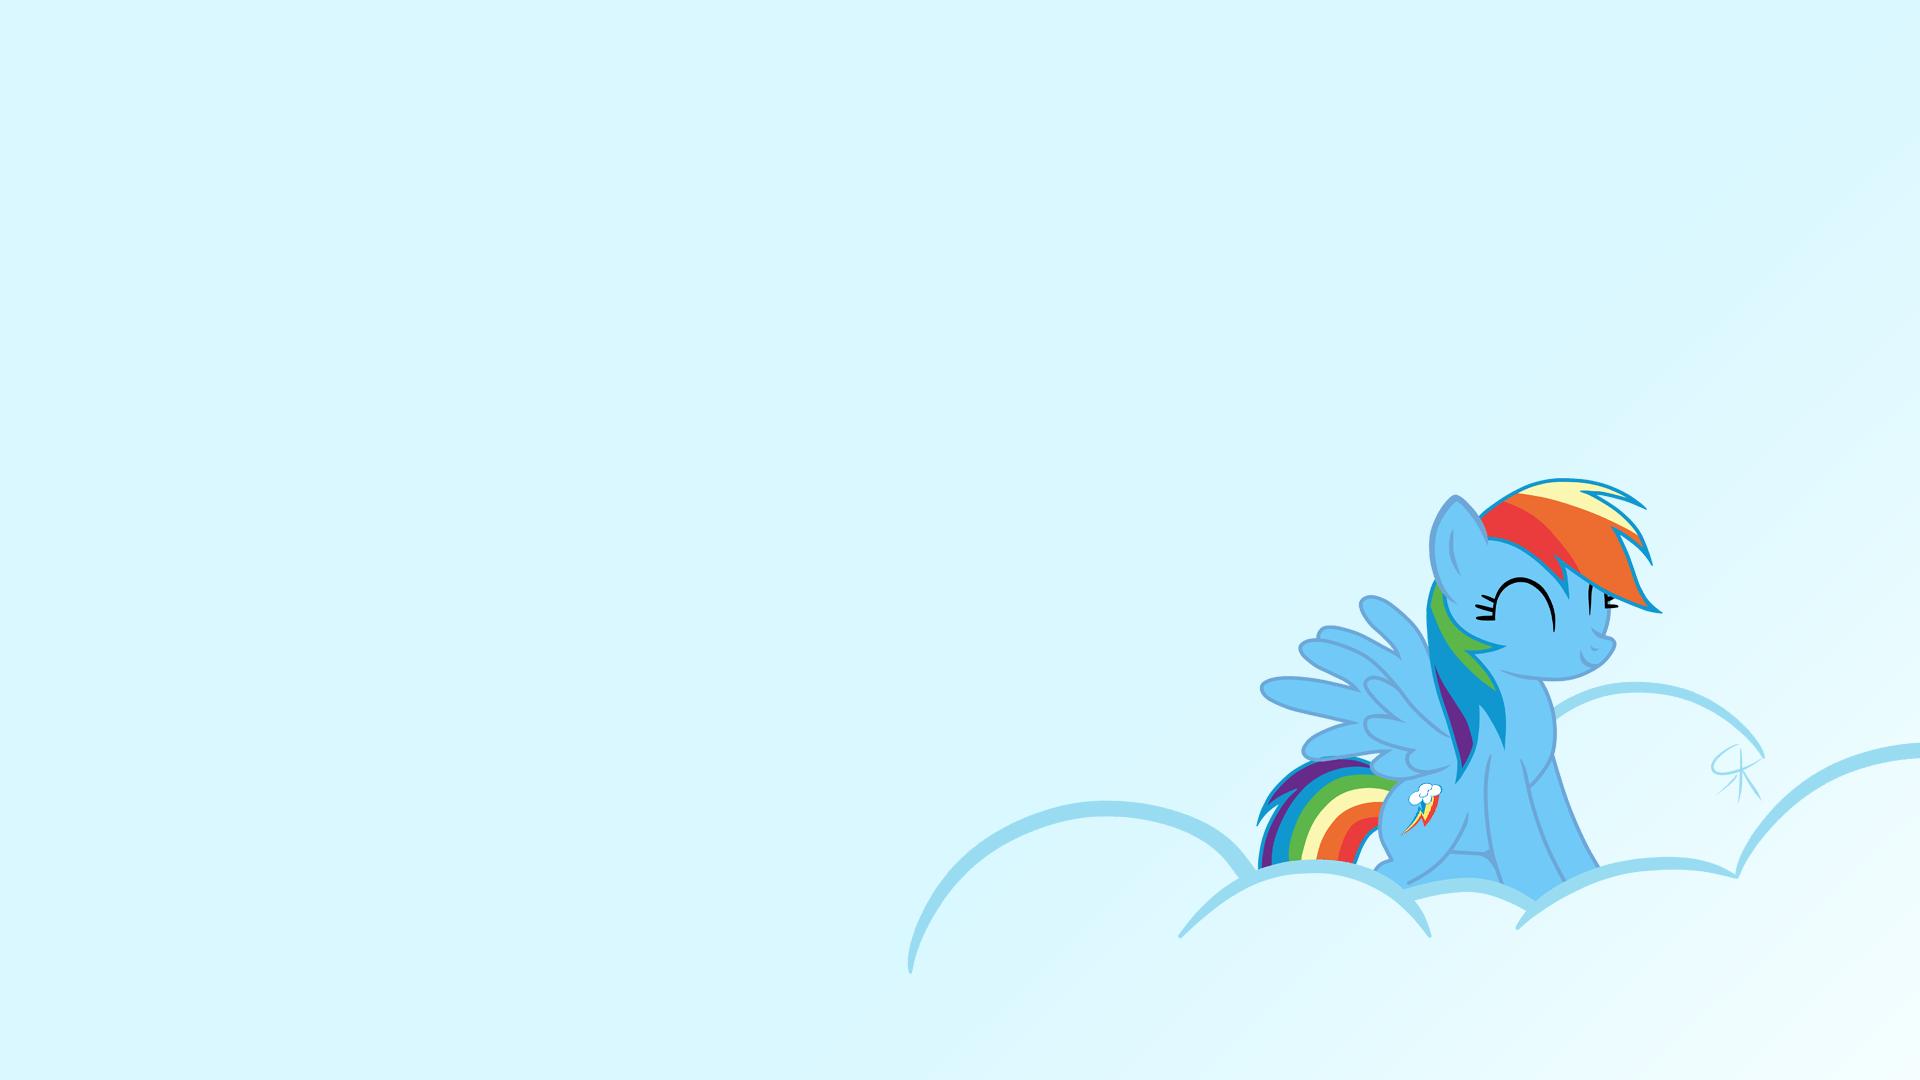 rainbow dash sphere background - photo #1